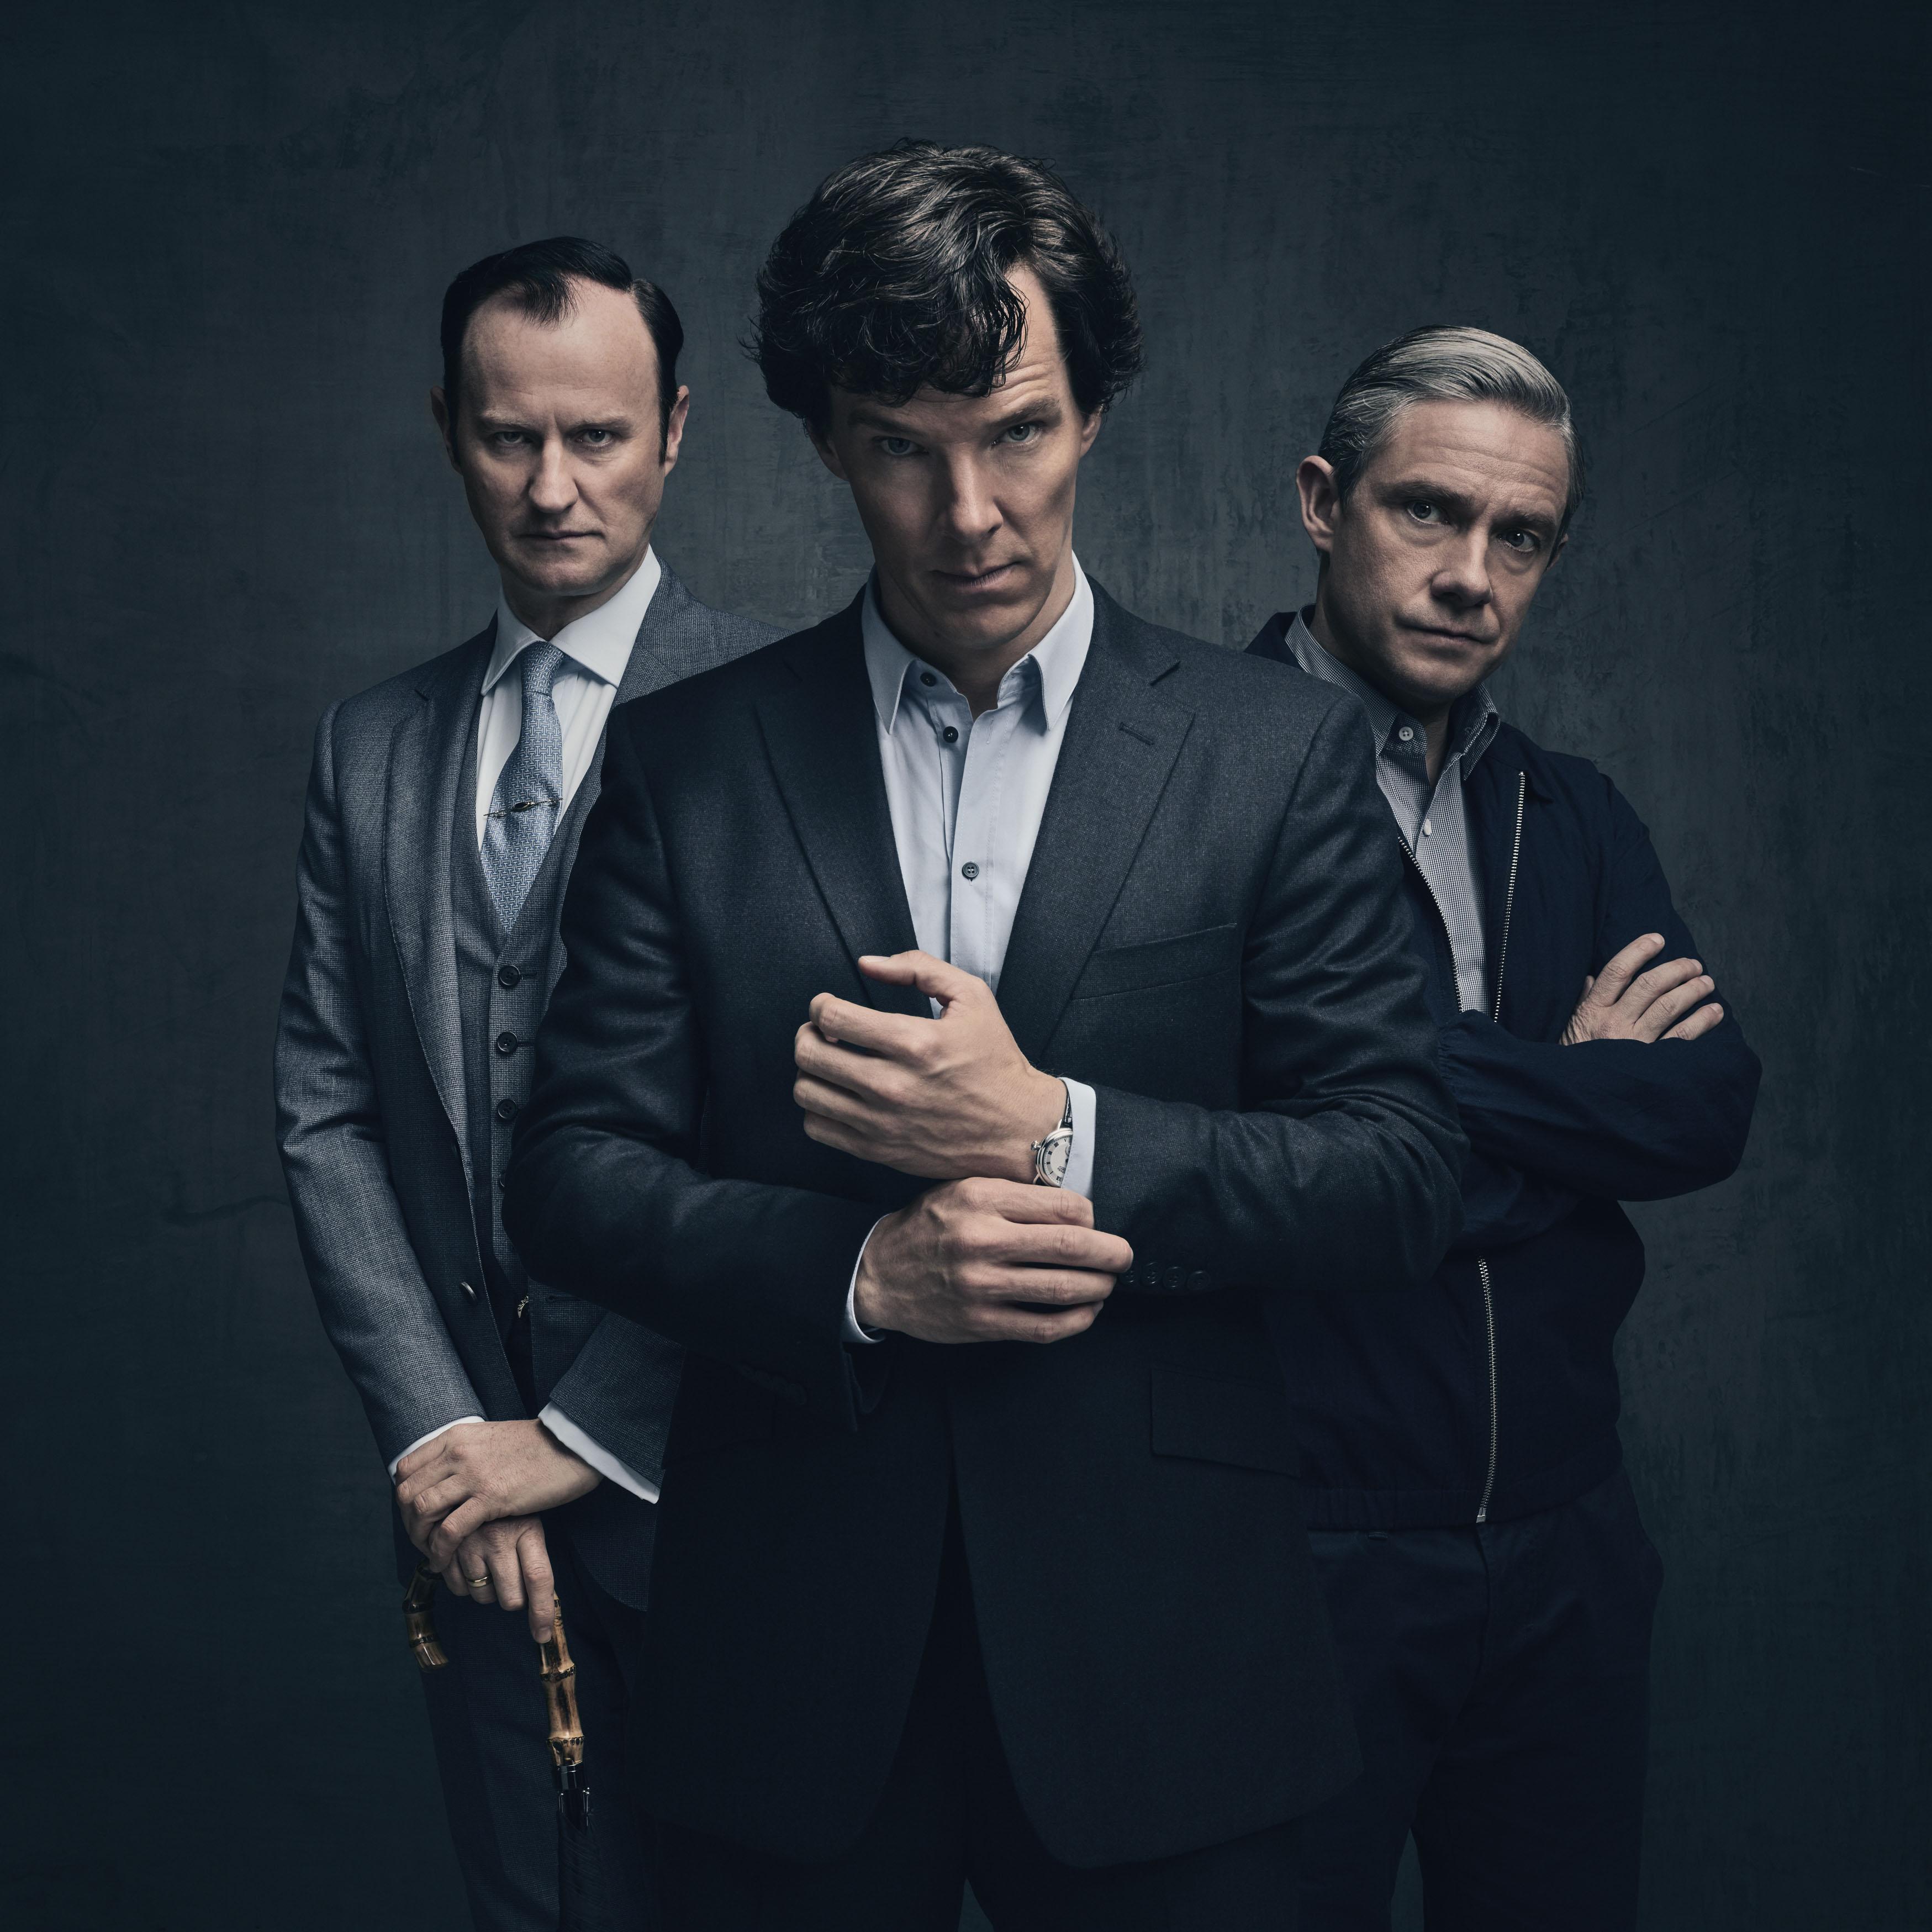 Sherlock - Series 4 - Character Promo Pics